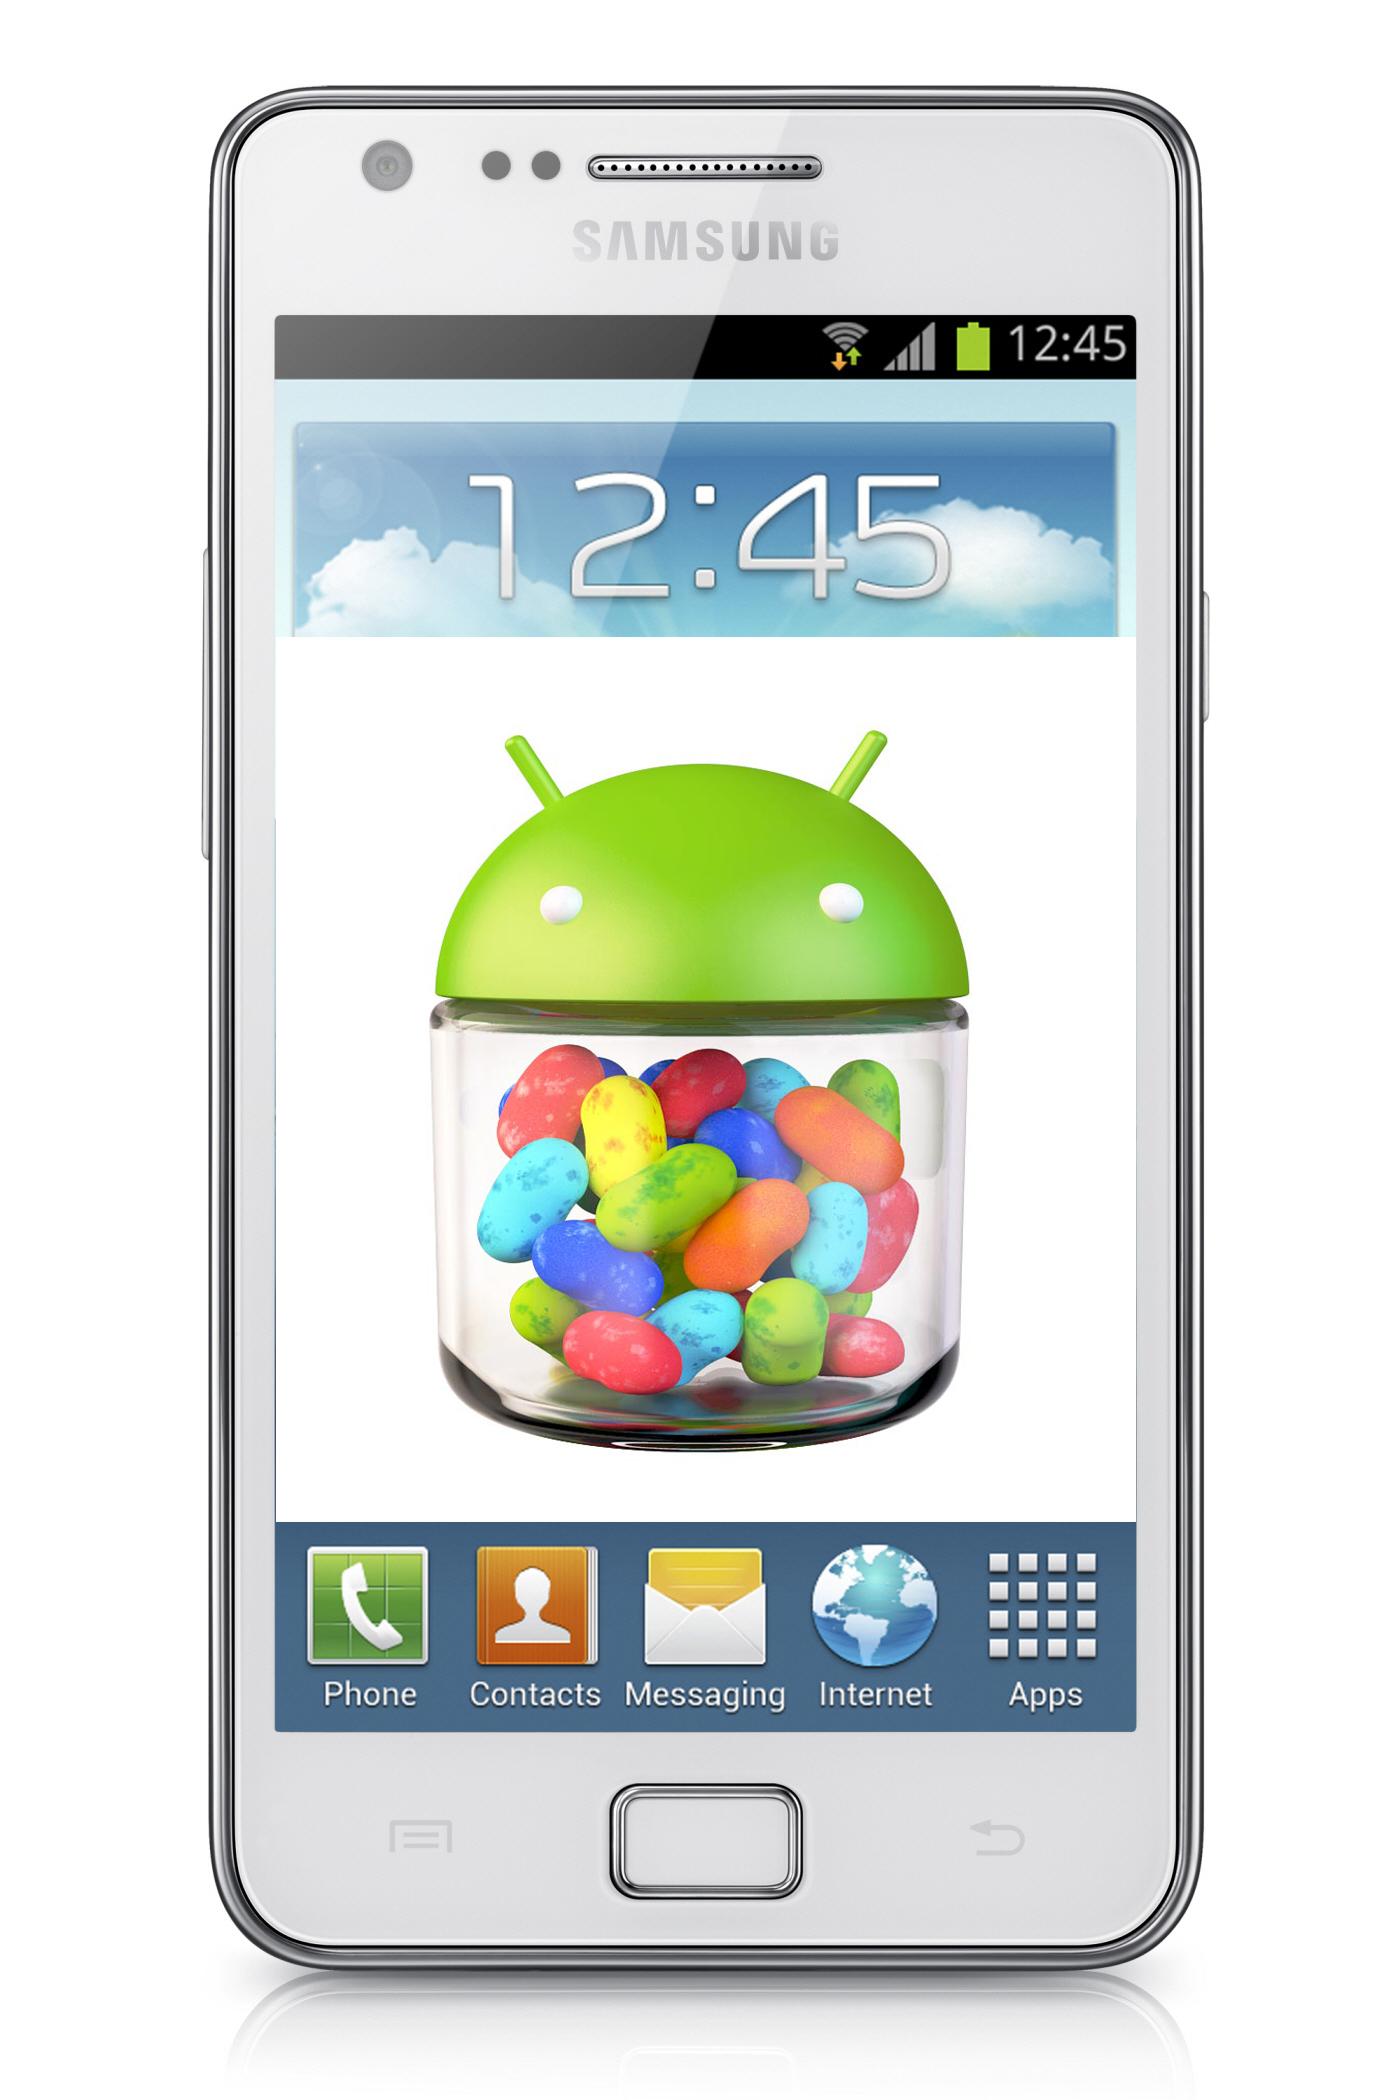 Manually Install Android 4.1.2 Jelly Bean Galaxy S 2 GT ...